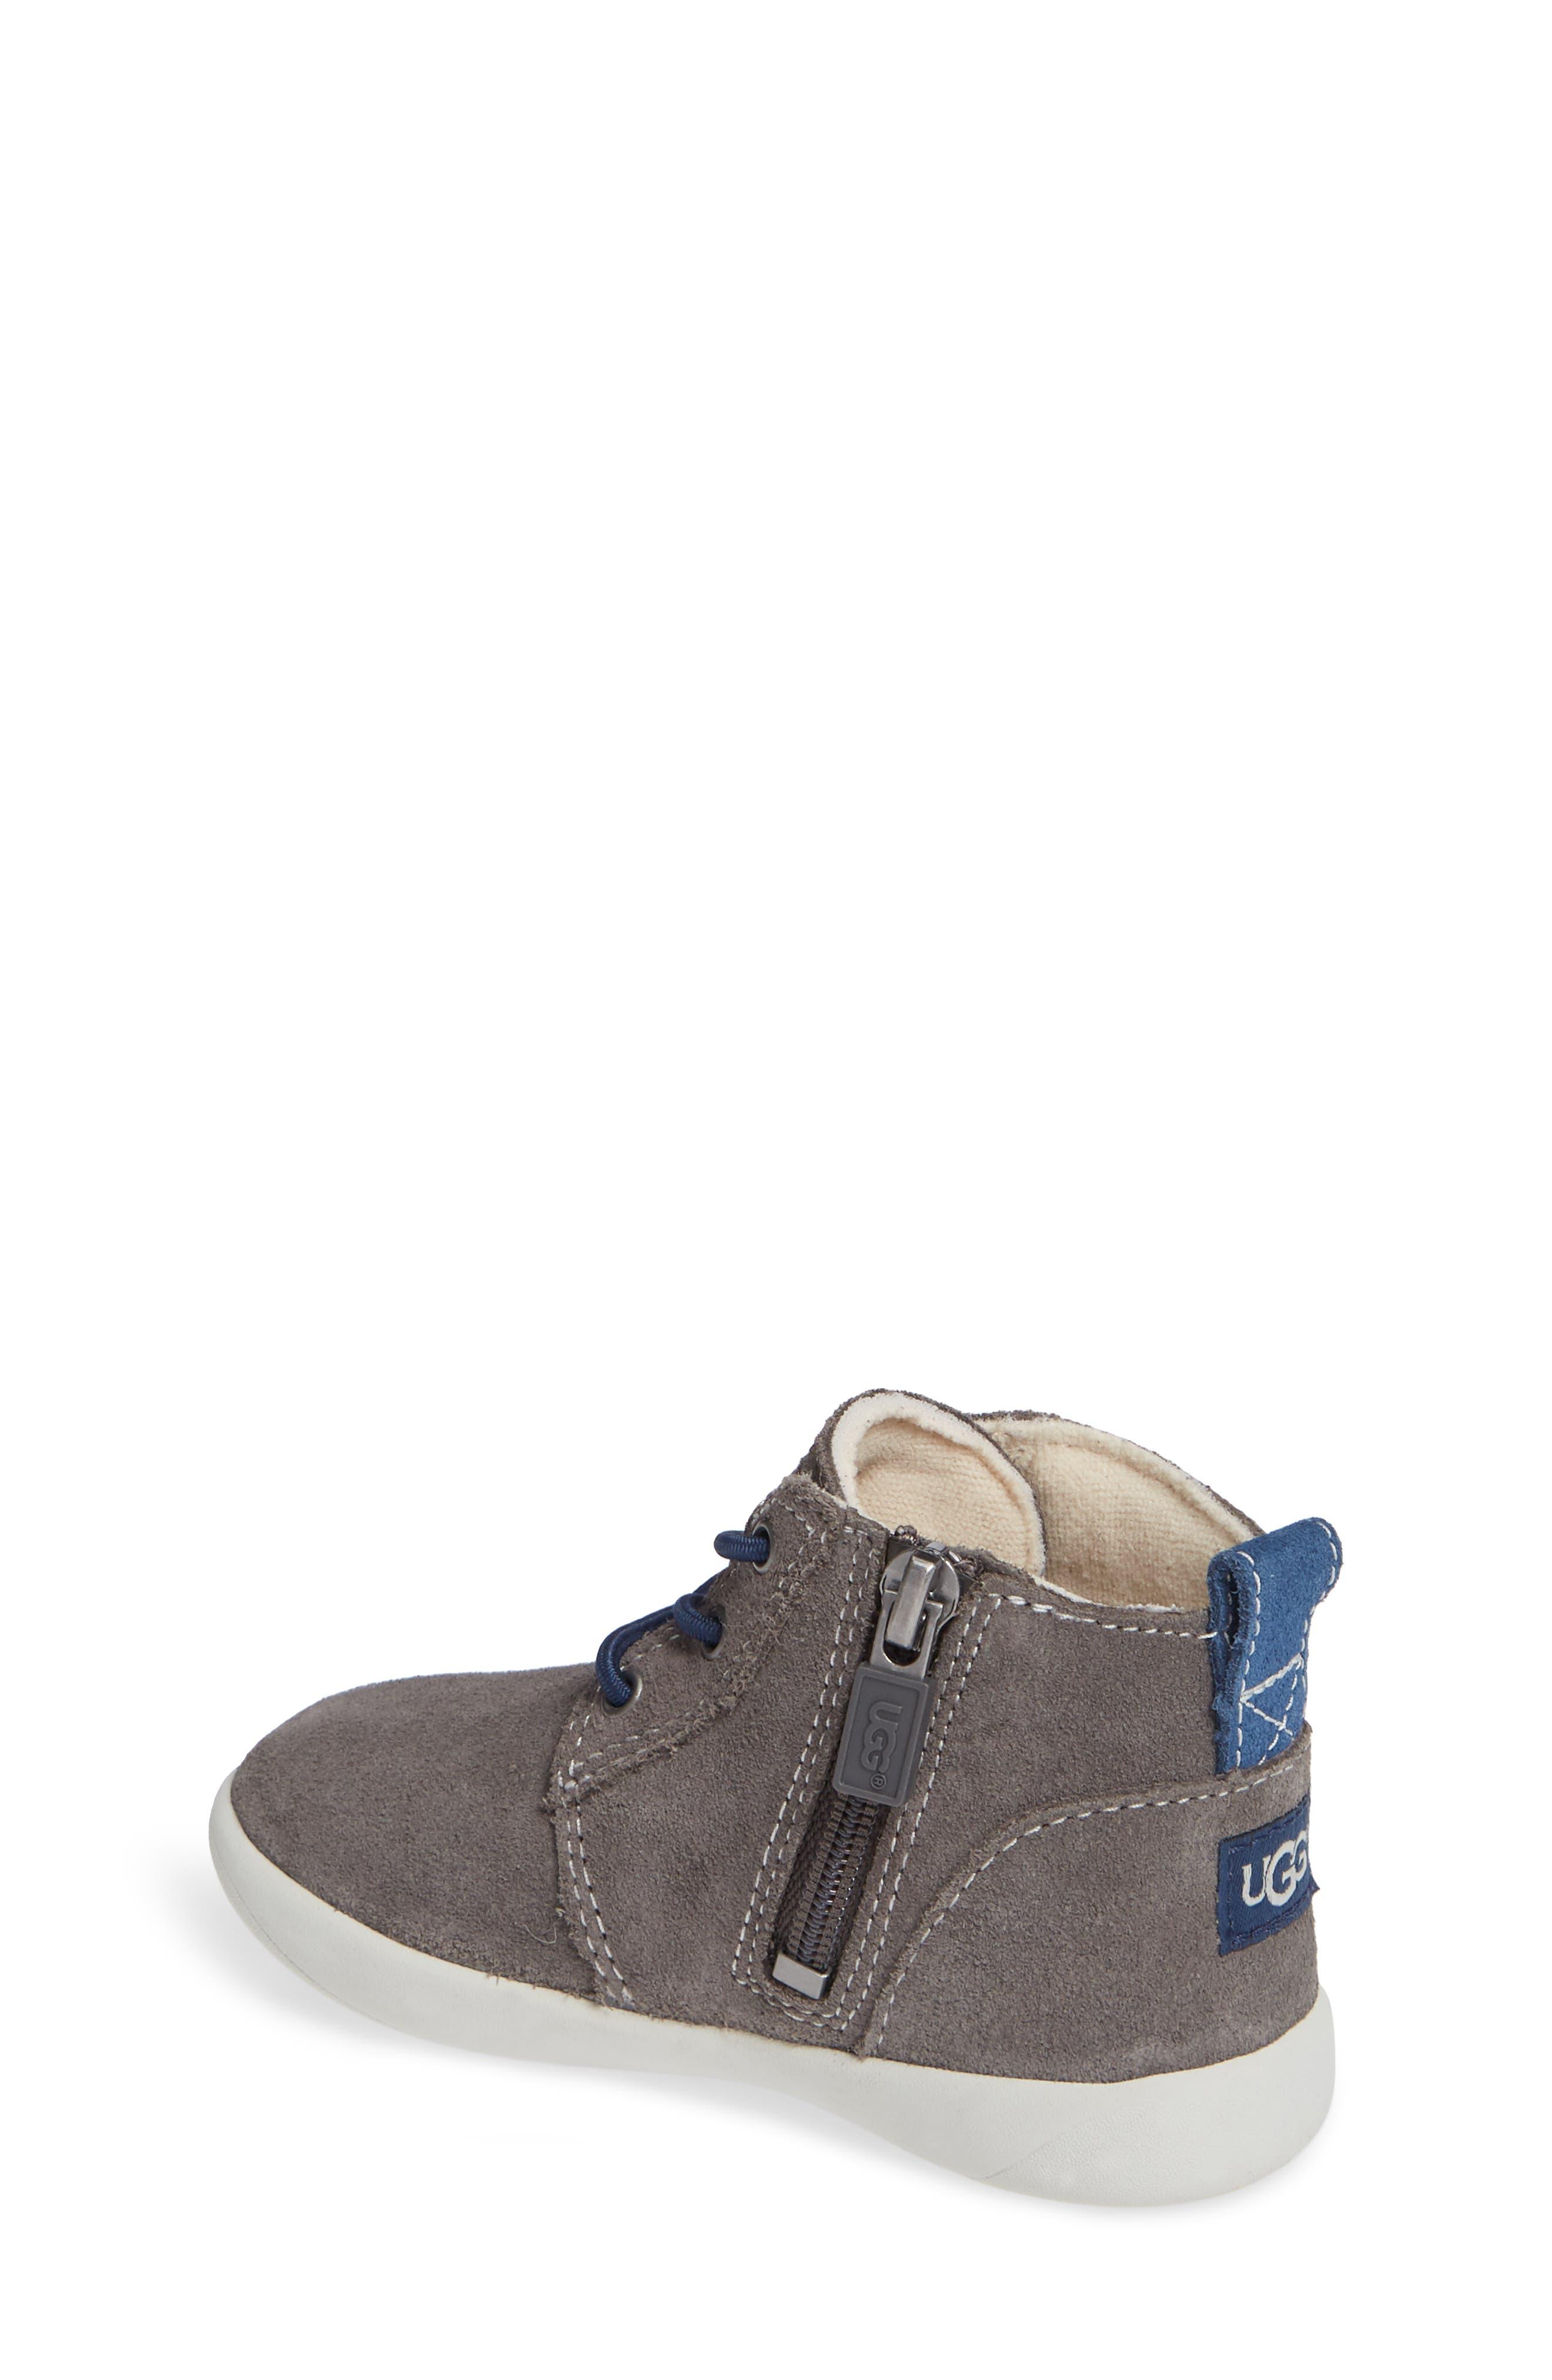 UGG<SUP>®</SUP>, Kristjan Chukka Sneaker, Alternate thumbnail 2, color, CHARCOAL GREY